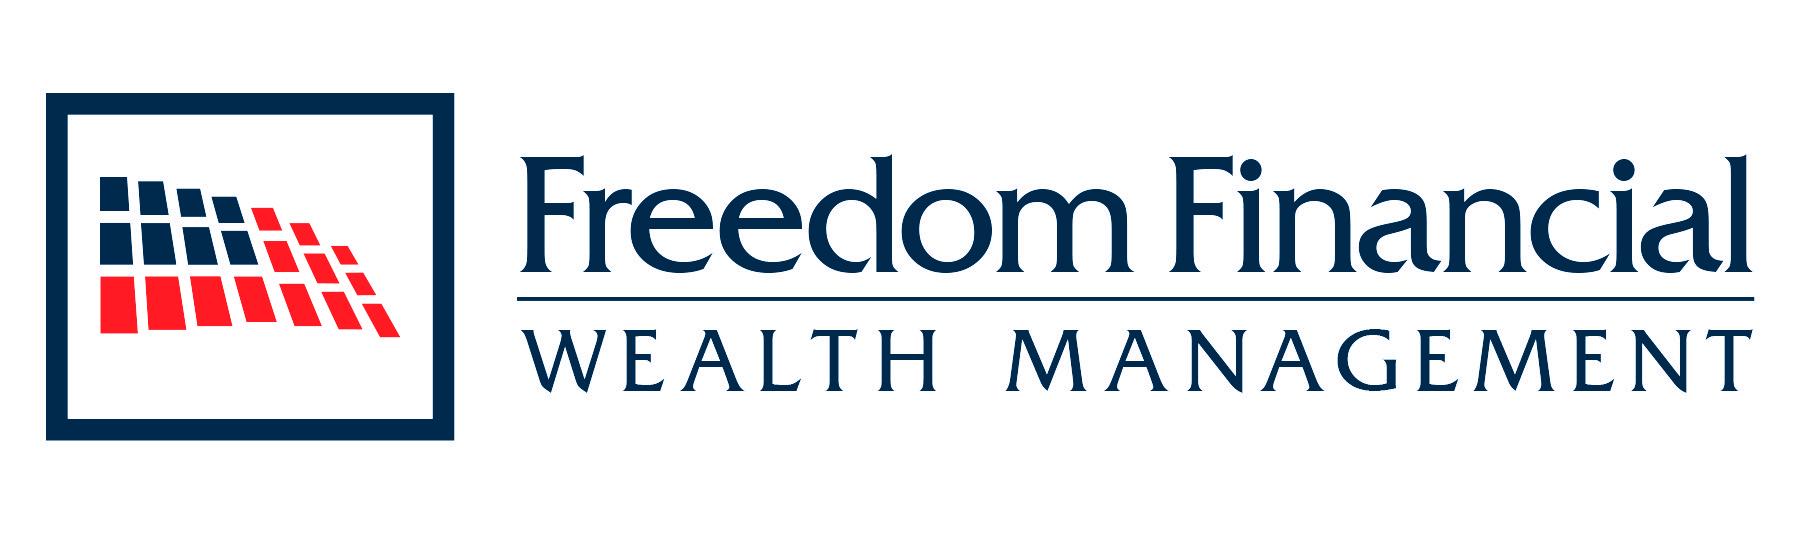 Freedom Financial Wealth Management Springfield Illinois.jpg